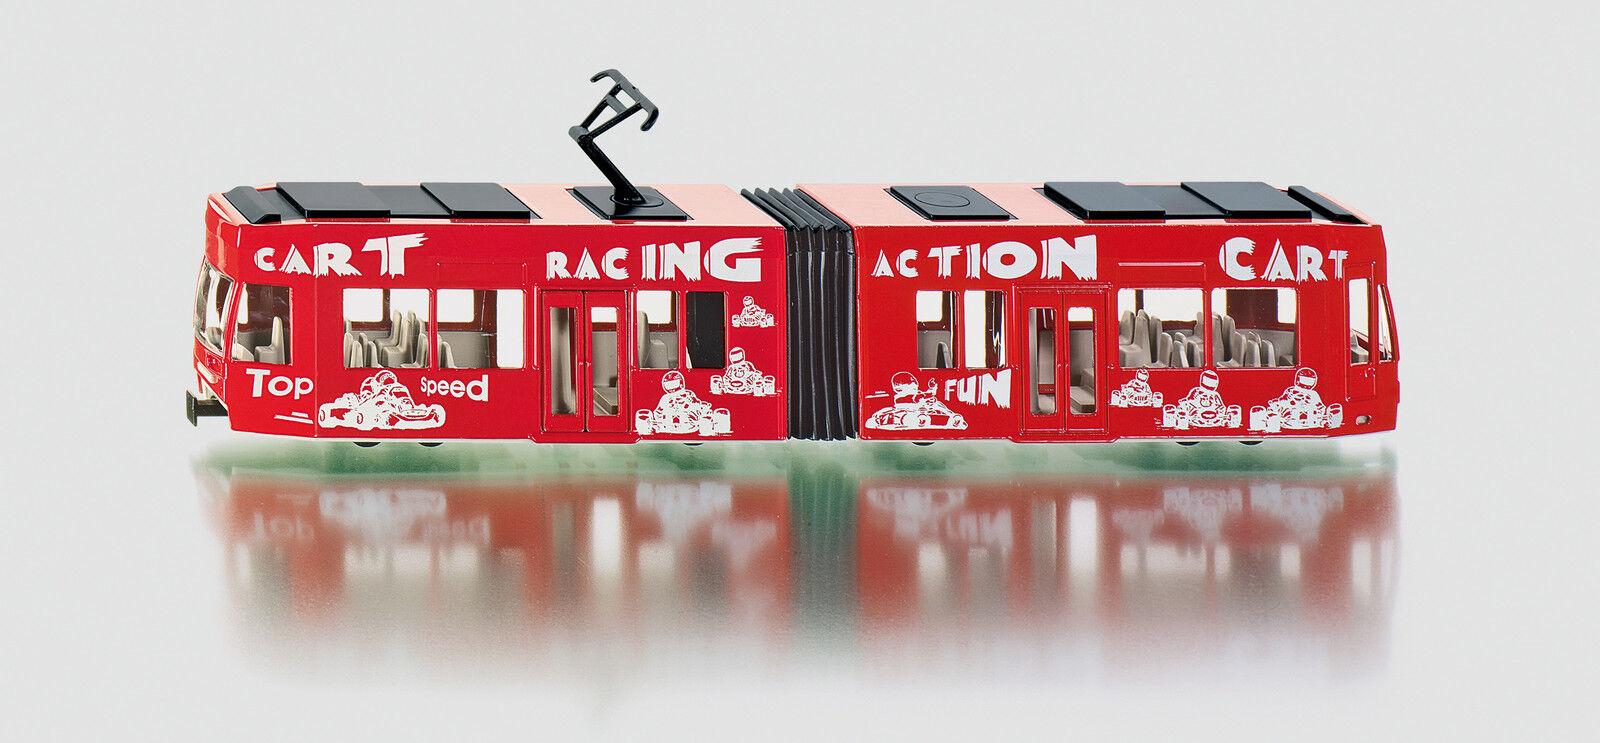 SIKU 1 55 MODELLO DIE CAST TRAM RACING ACTION CART rouge TRAMWAY ART 3726